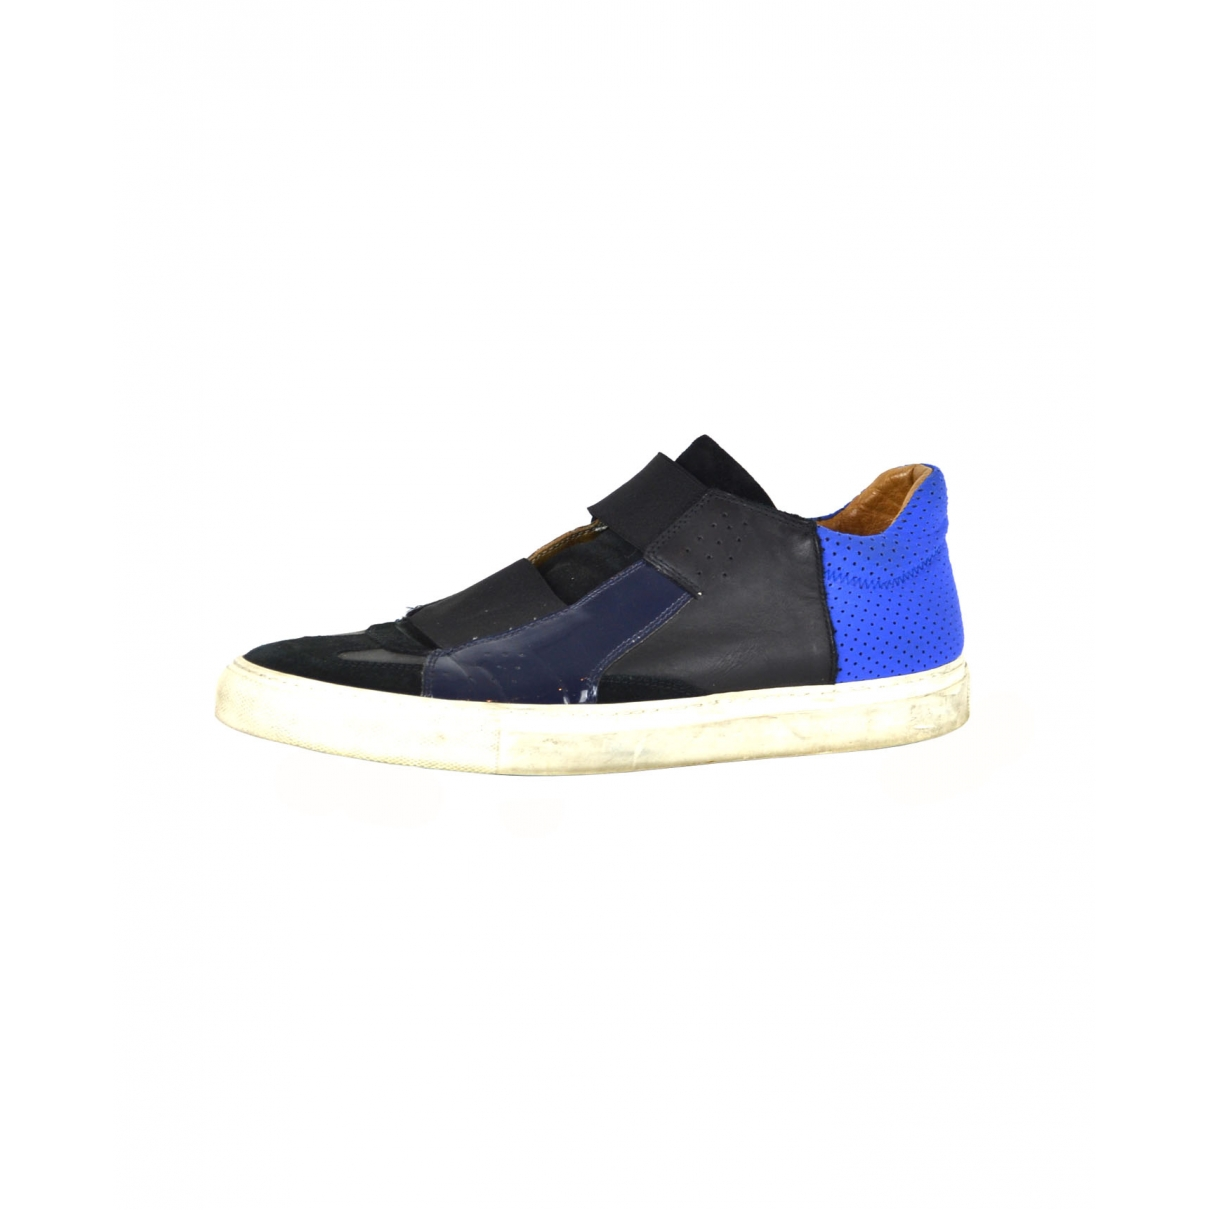 Maison Martin Margiela \N Sneakers in  Blau Leder